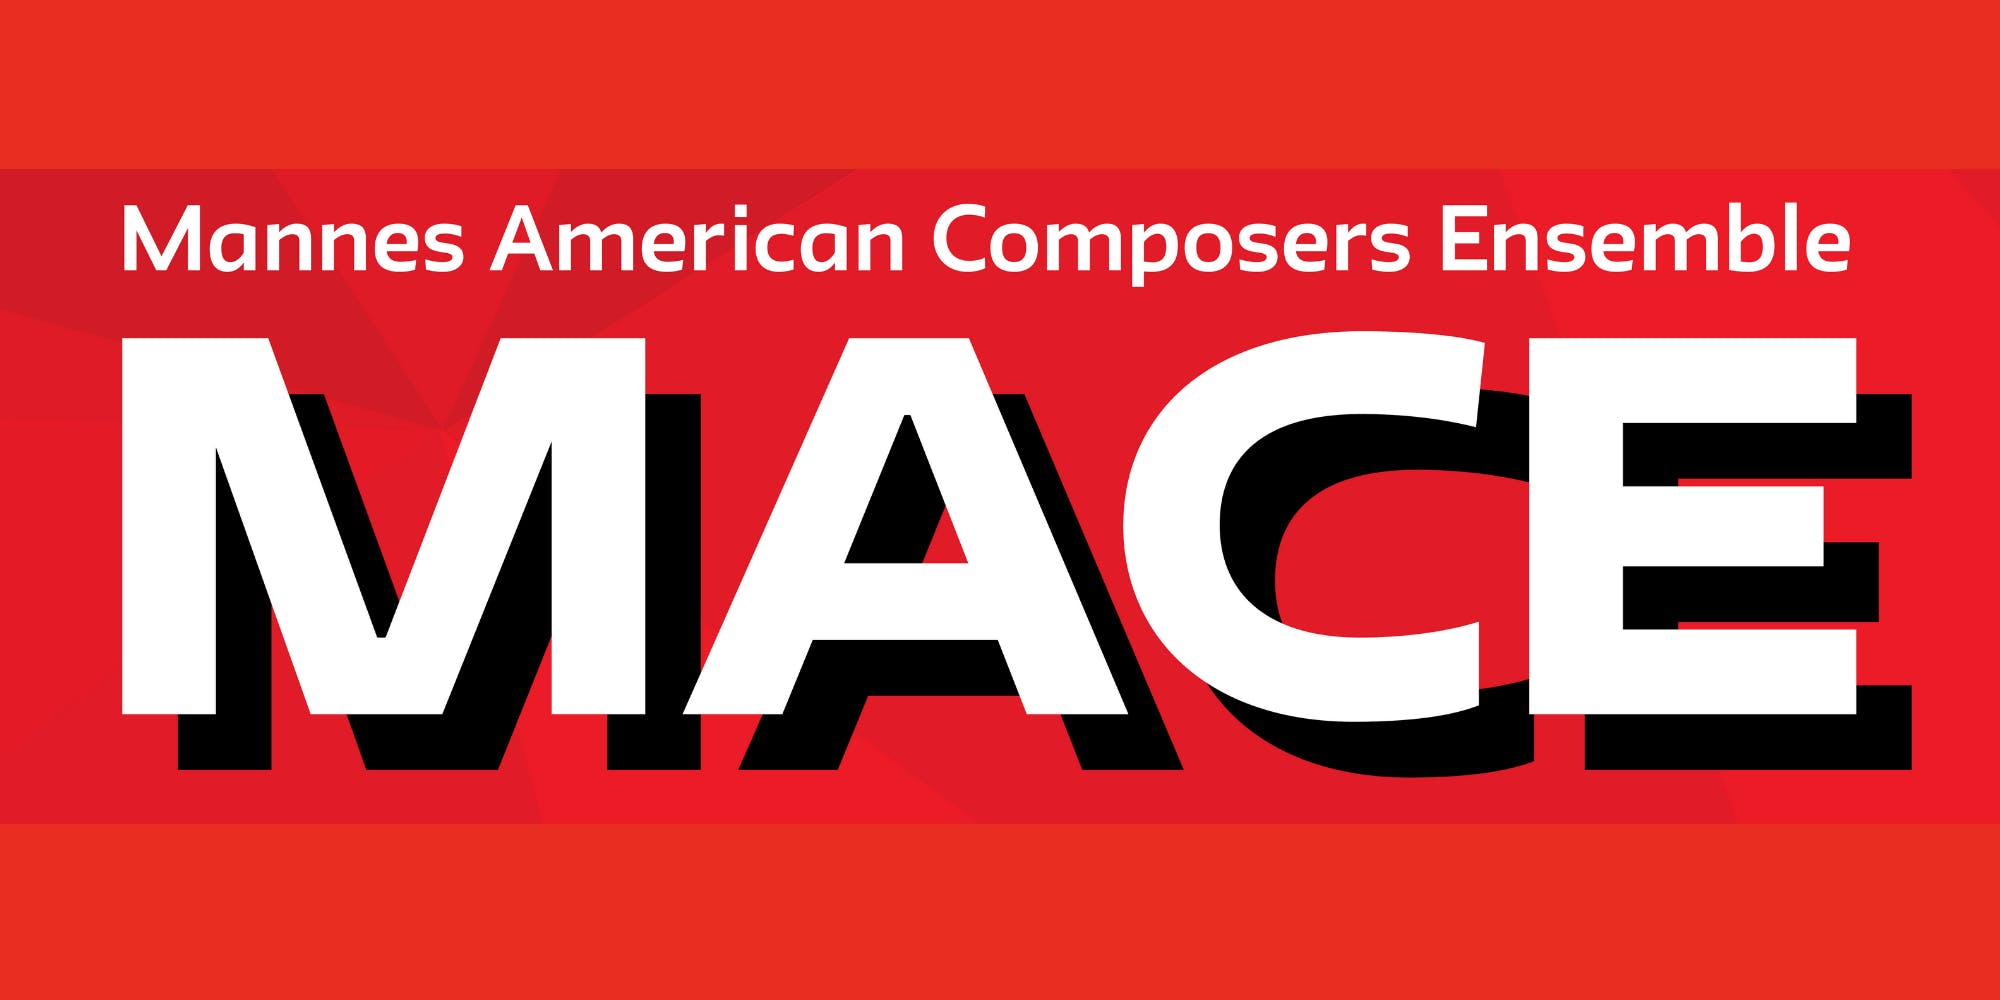 MACE (Mannes American Composers Ensemble)